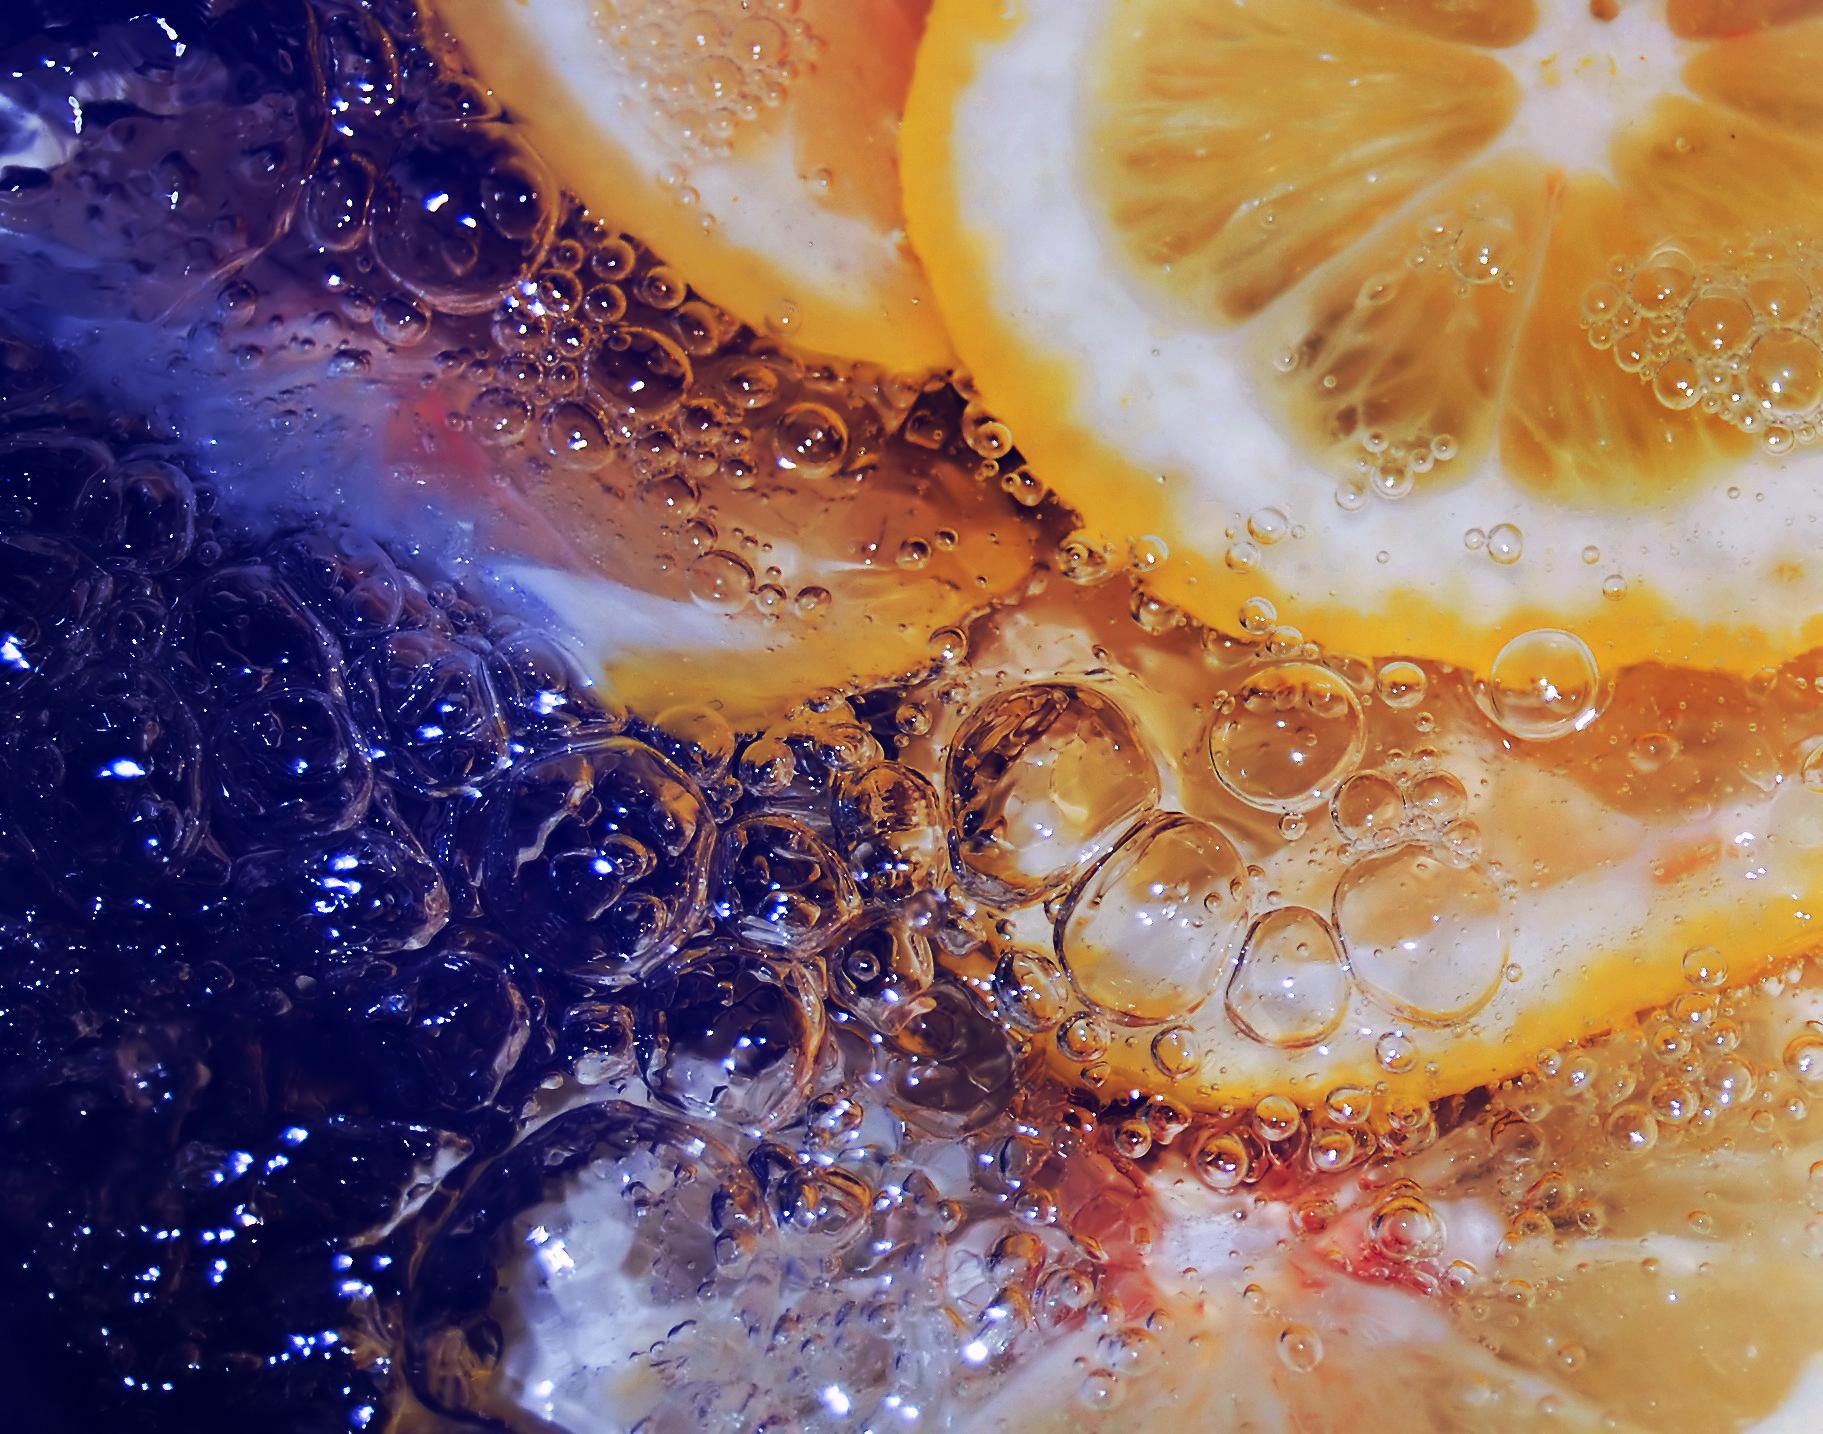 Картинки с фруктами на воде